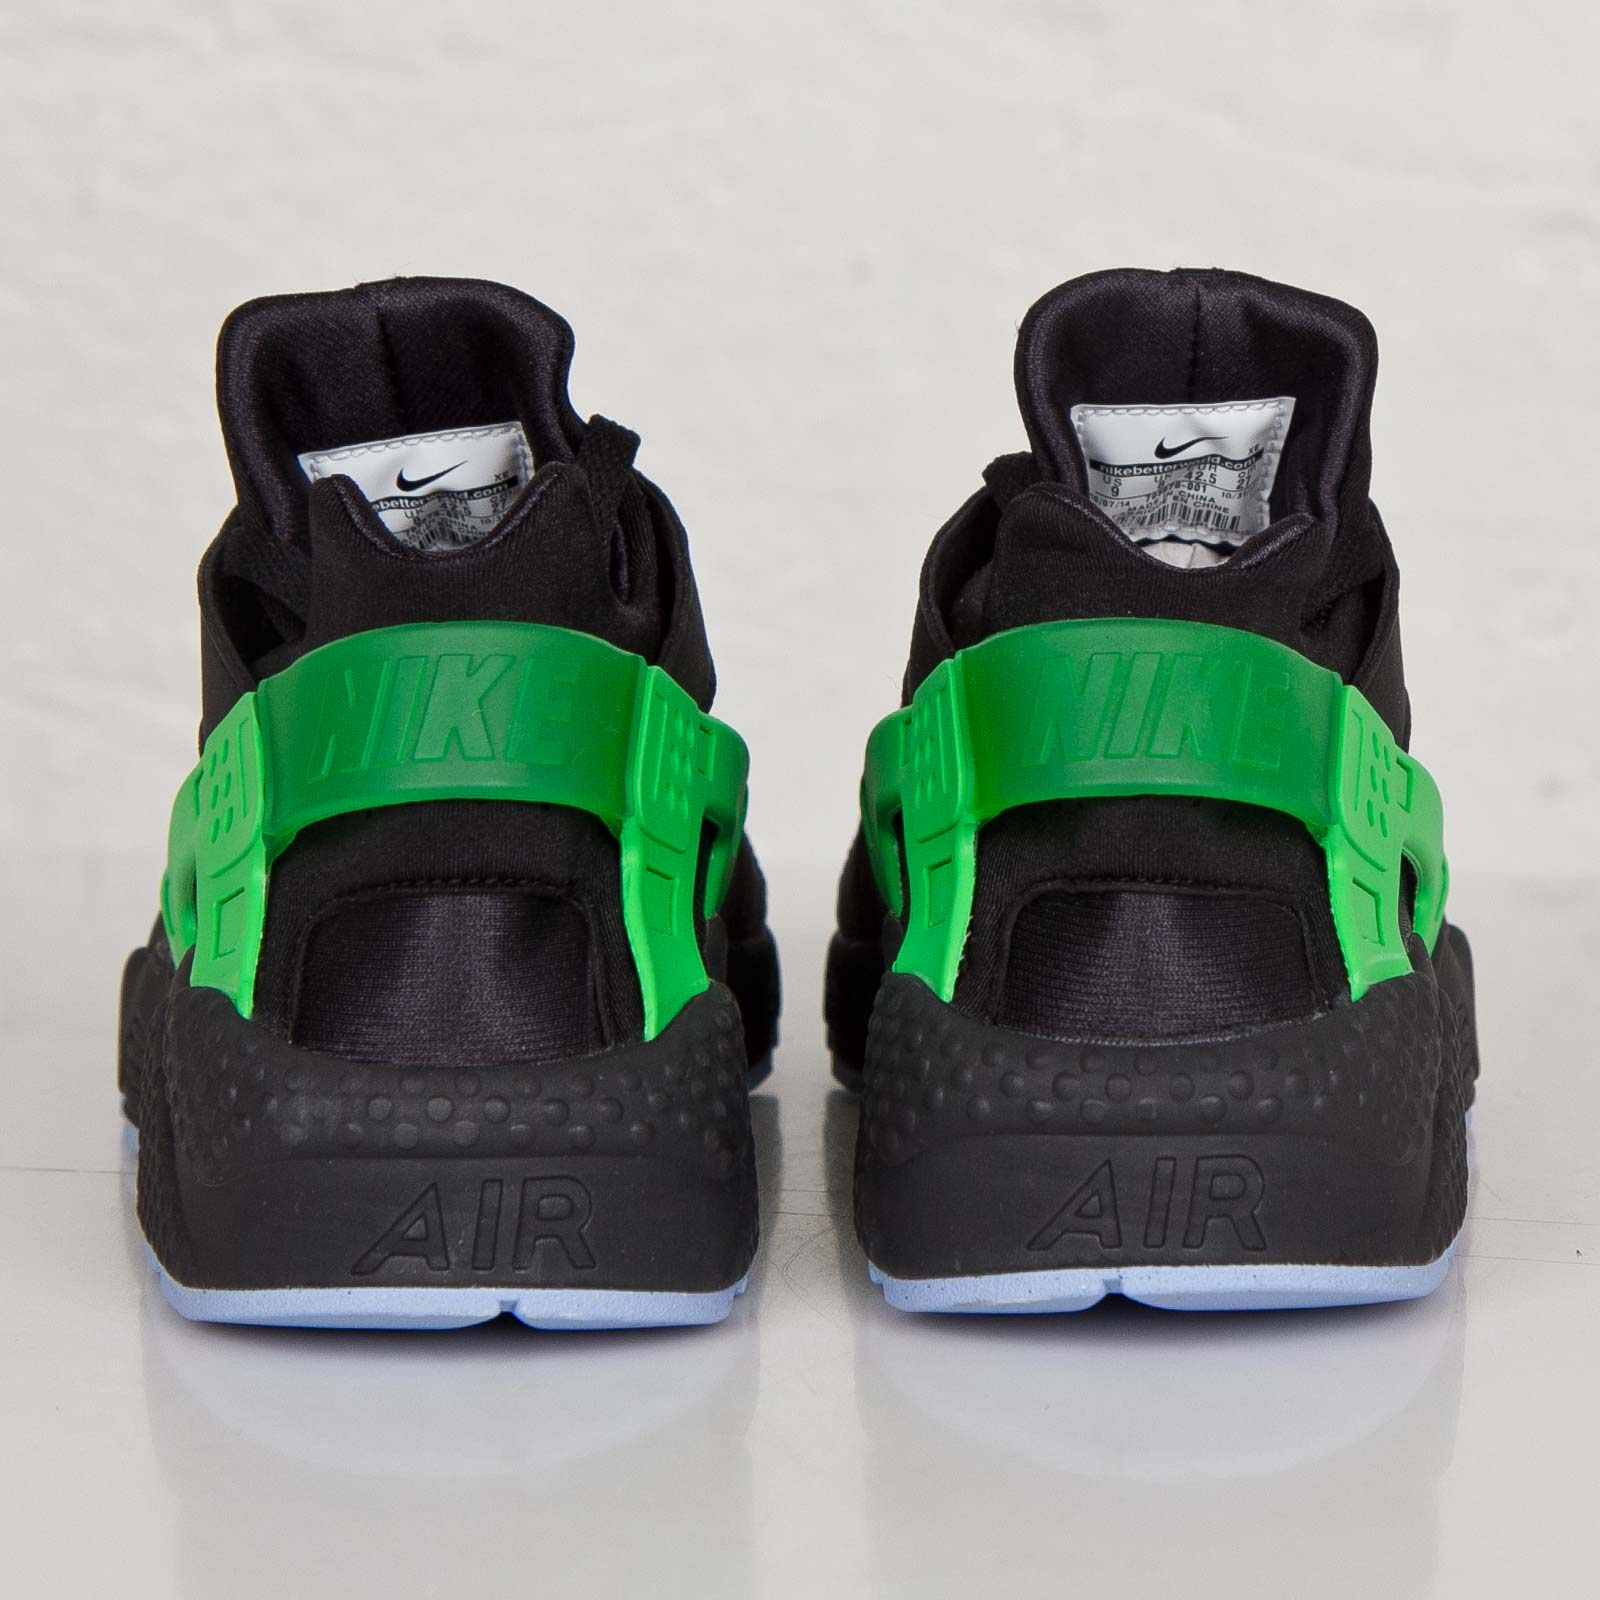 the best attitude a620a 323aa Nike Air Huarache Run FB - 705070-001 - Sneakersnstuff | sneakers &  streetwear online since 1999